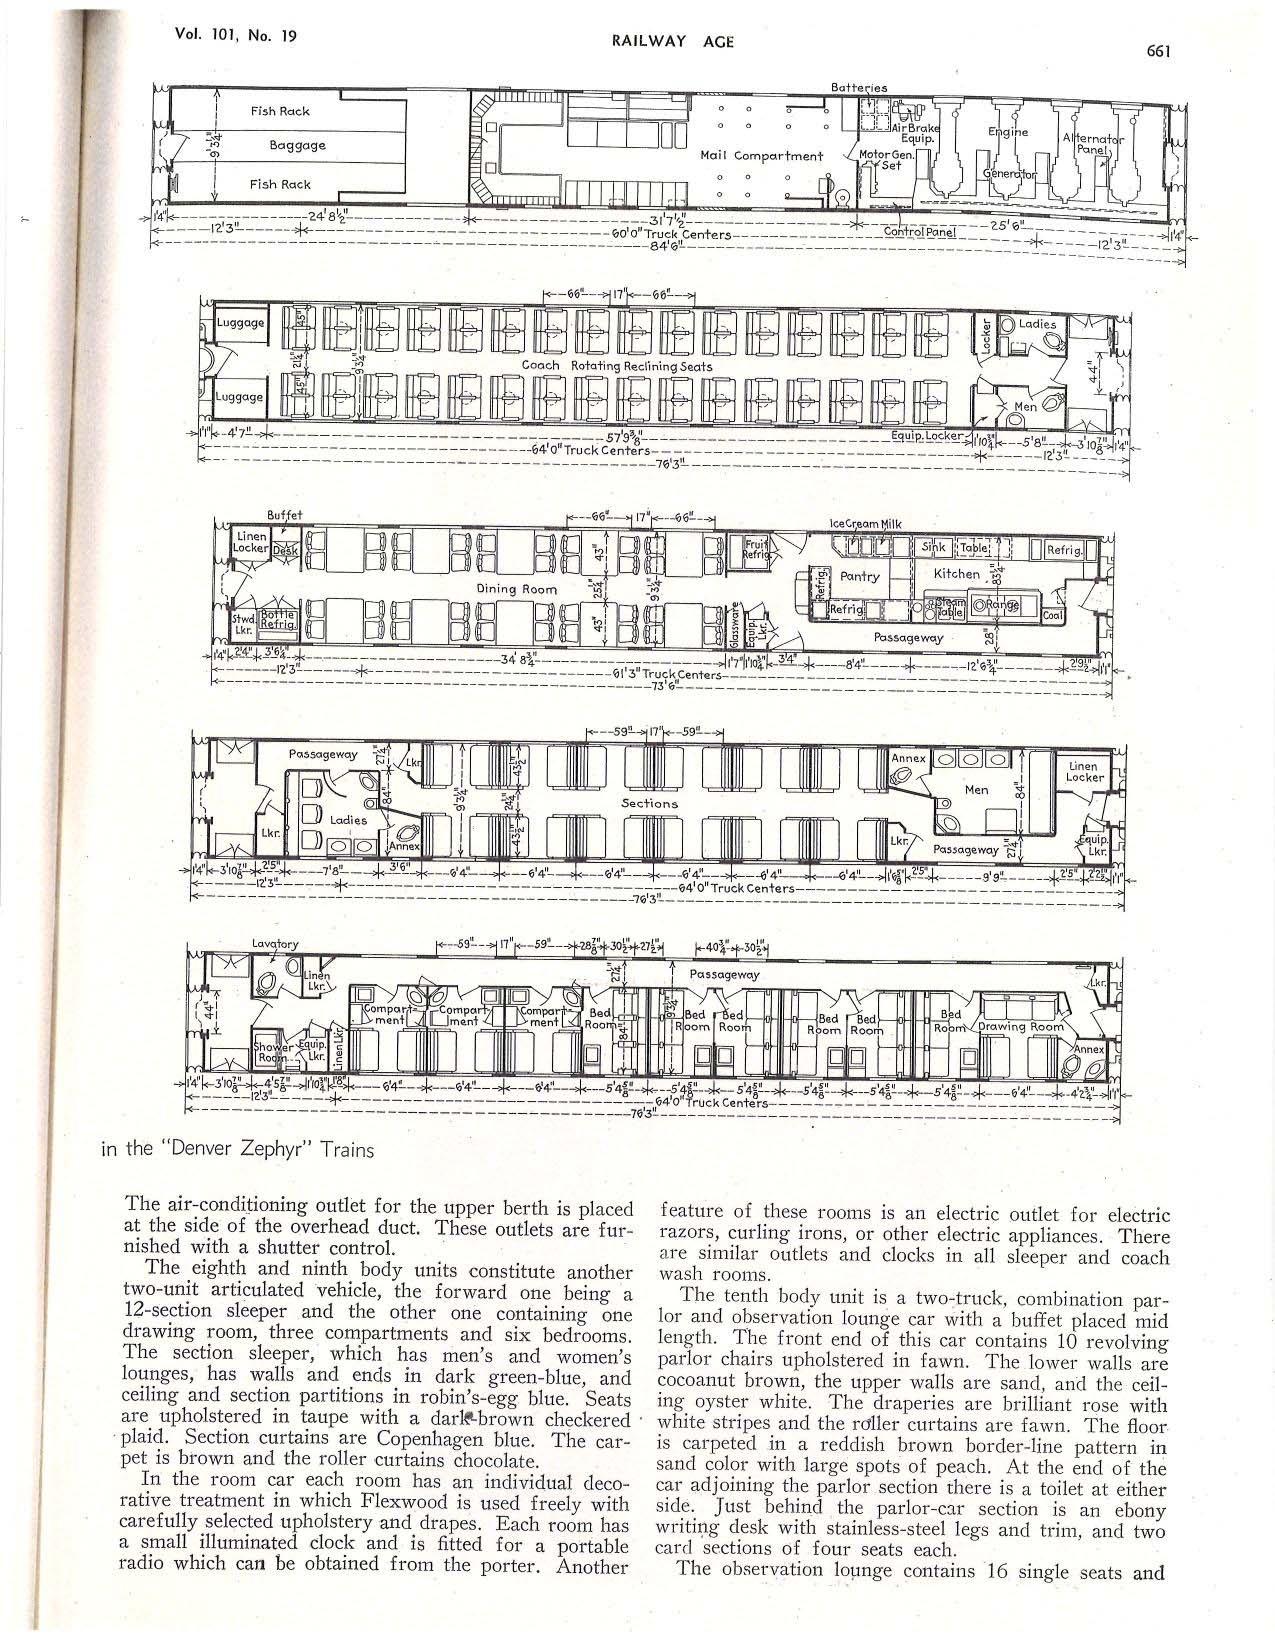 1936+Railway+Age+Article+-+Compressed 4.jpg